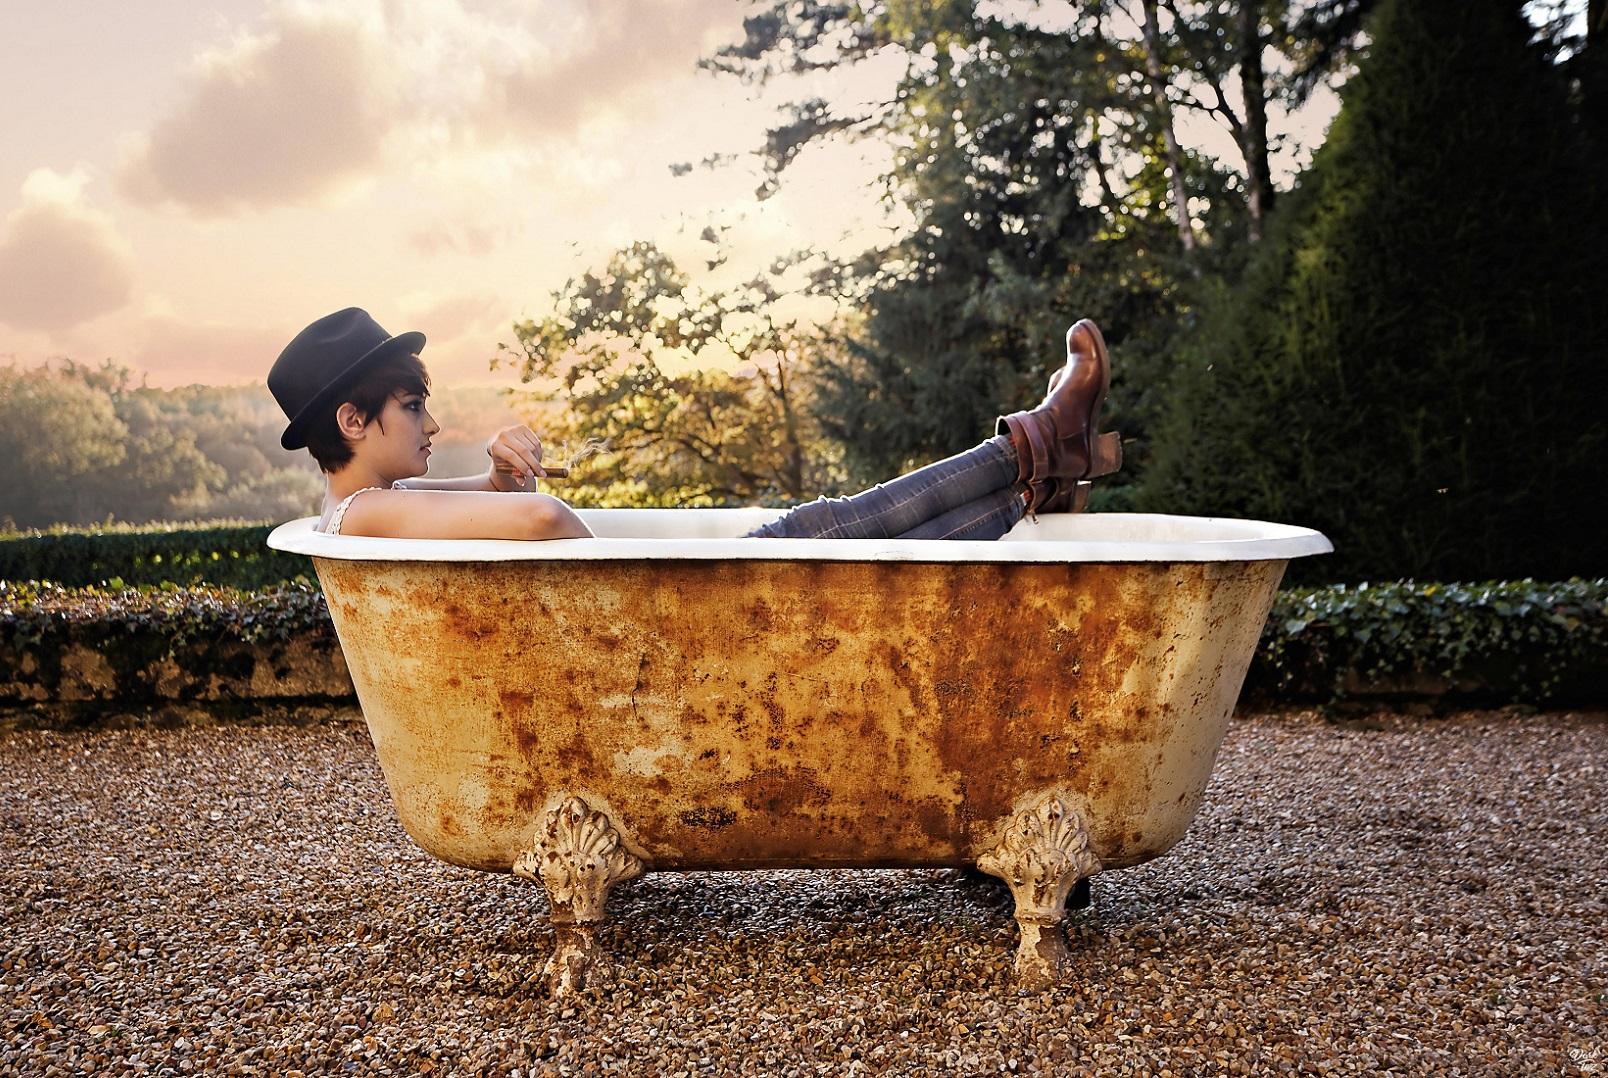 model, urbex, bath